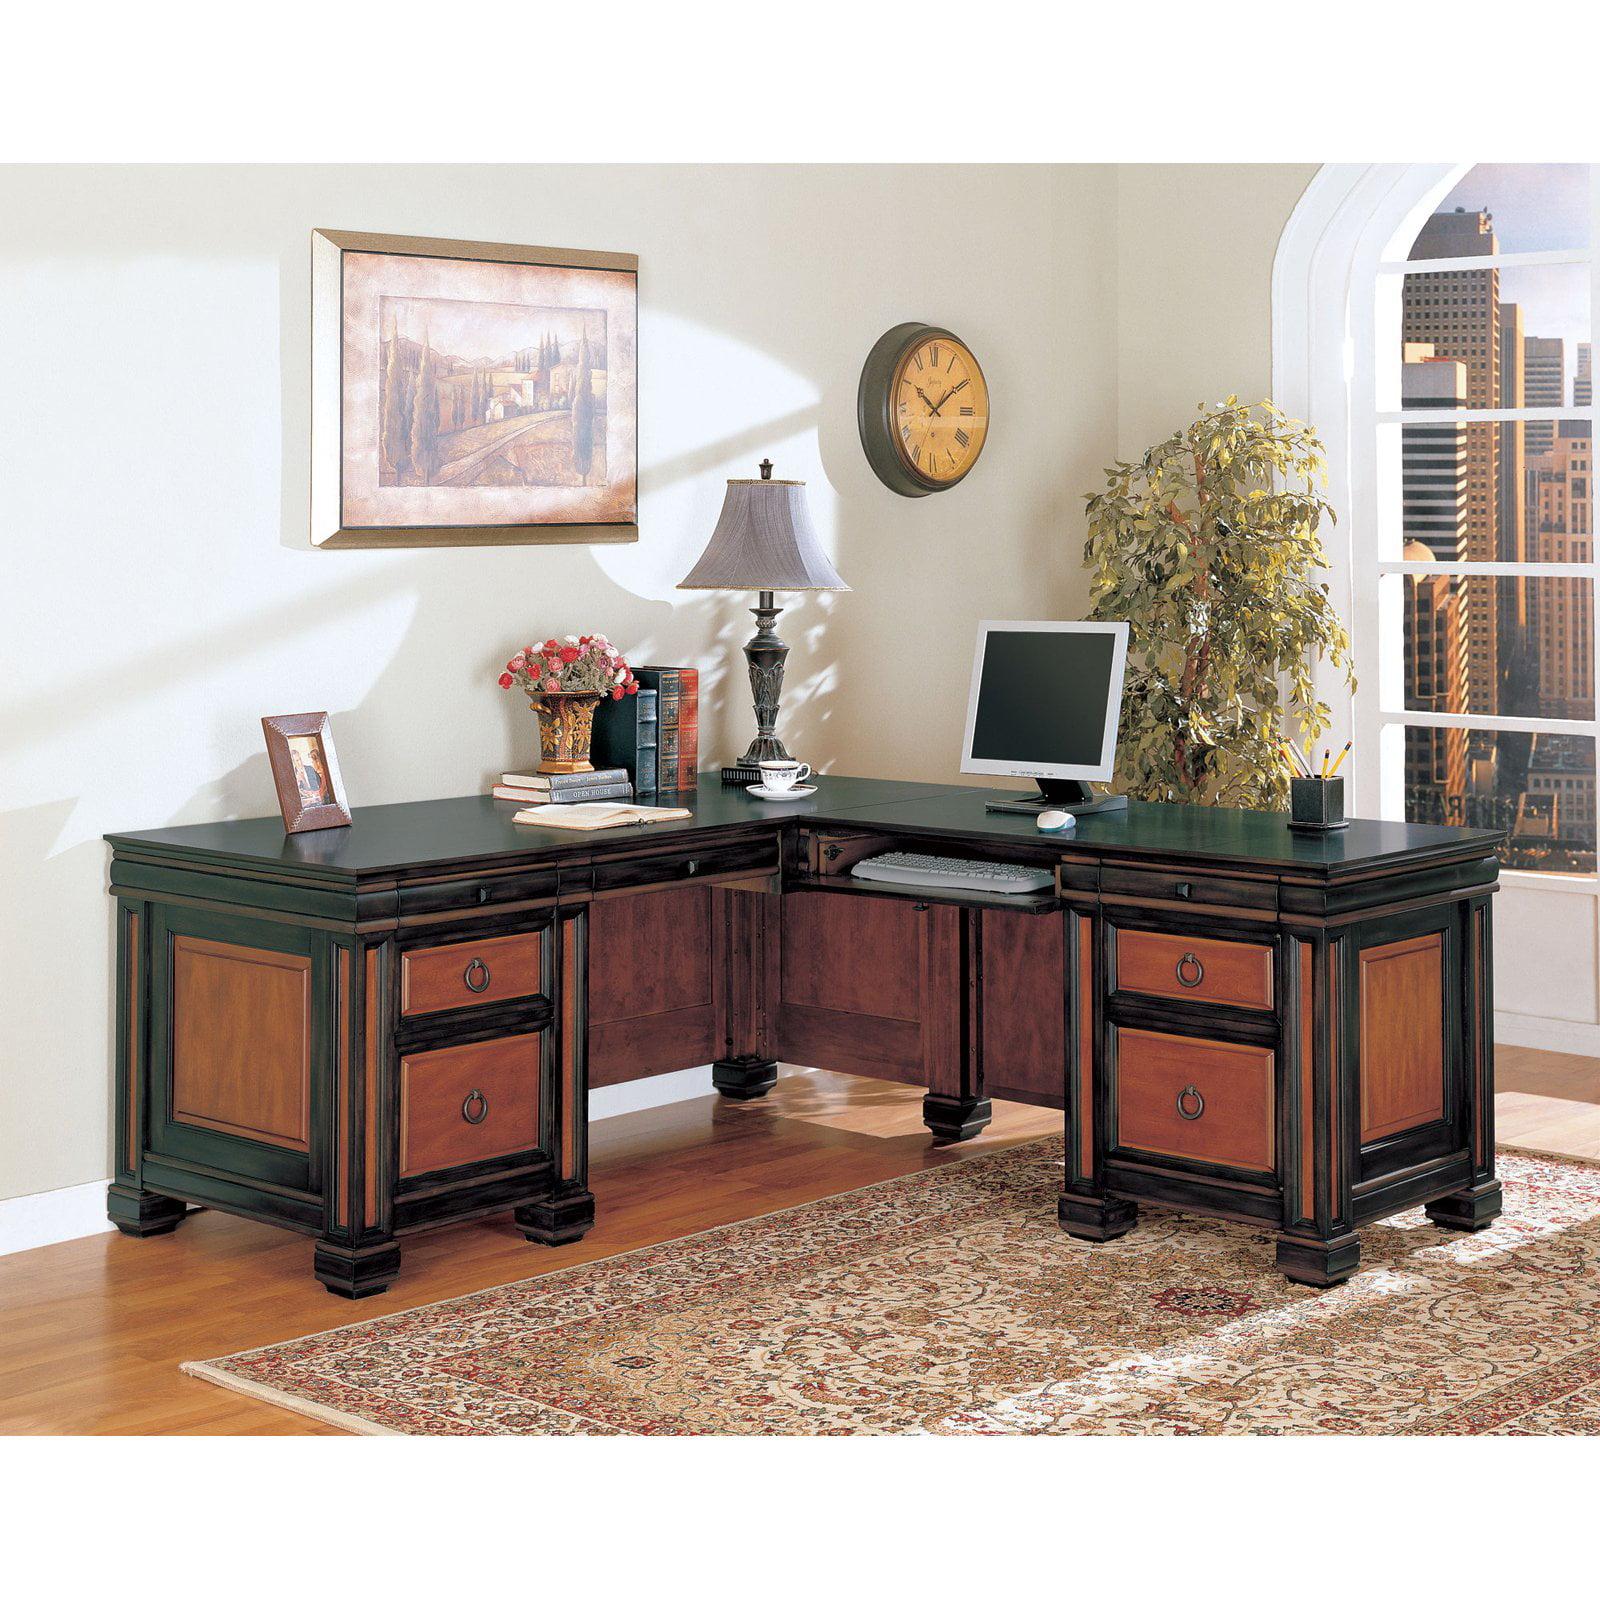 Coaster Furniture Tate Office Desk